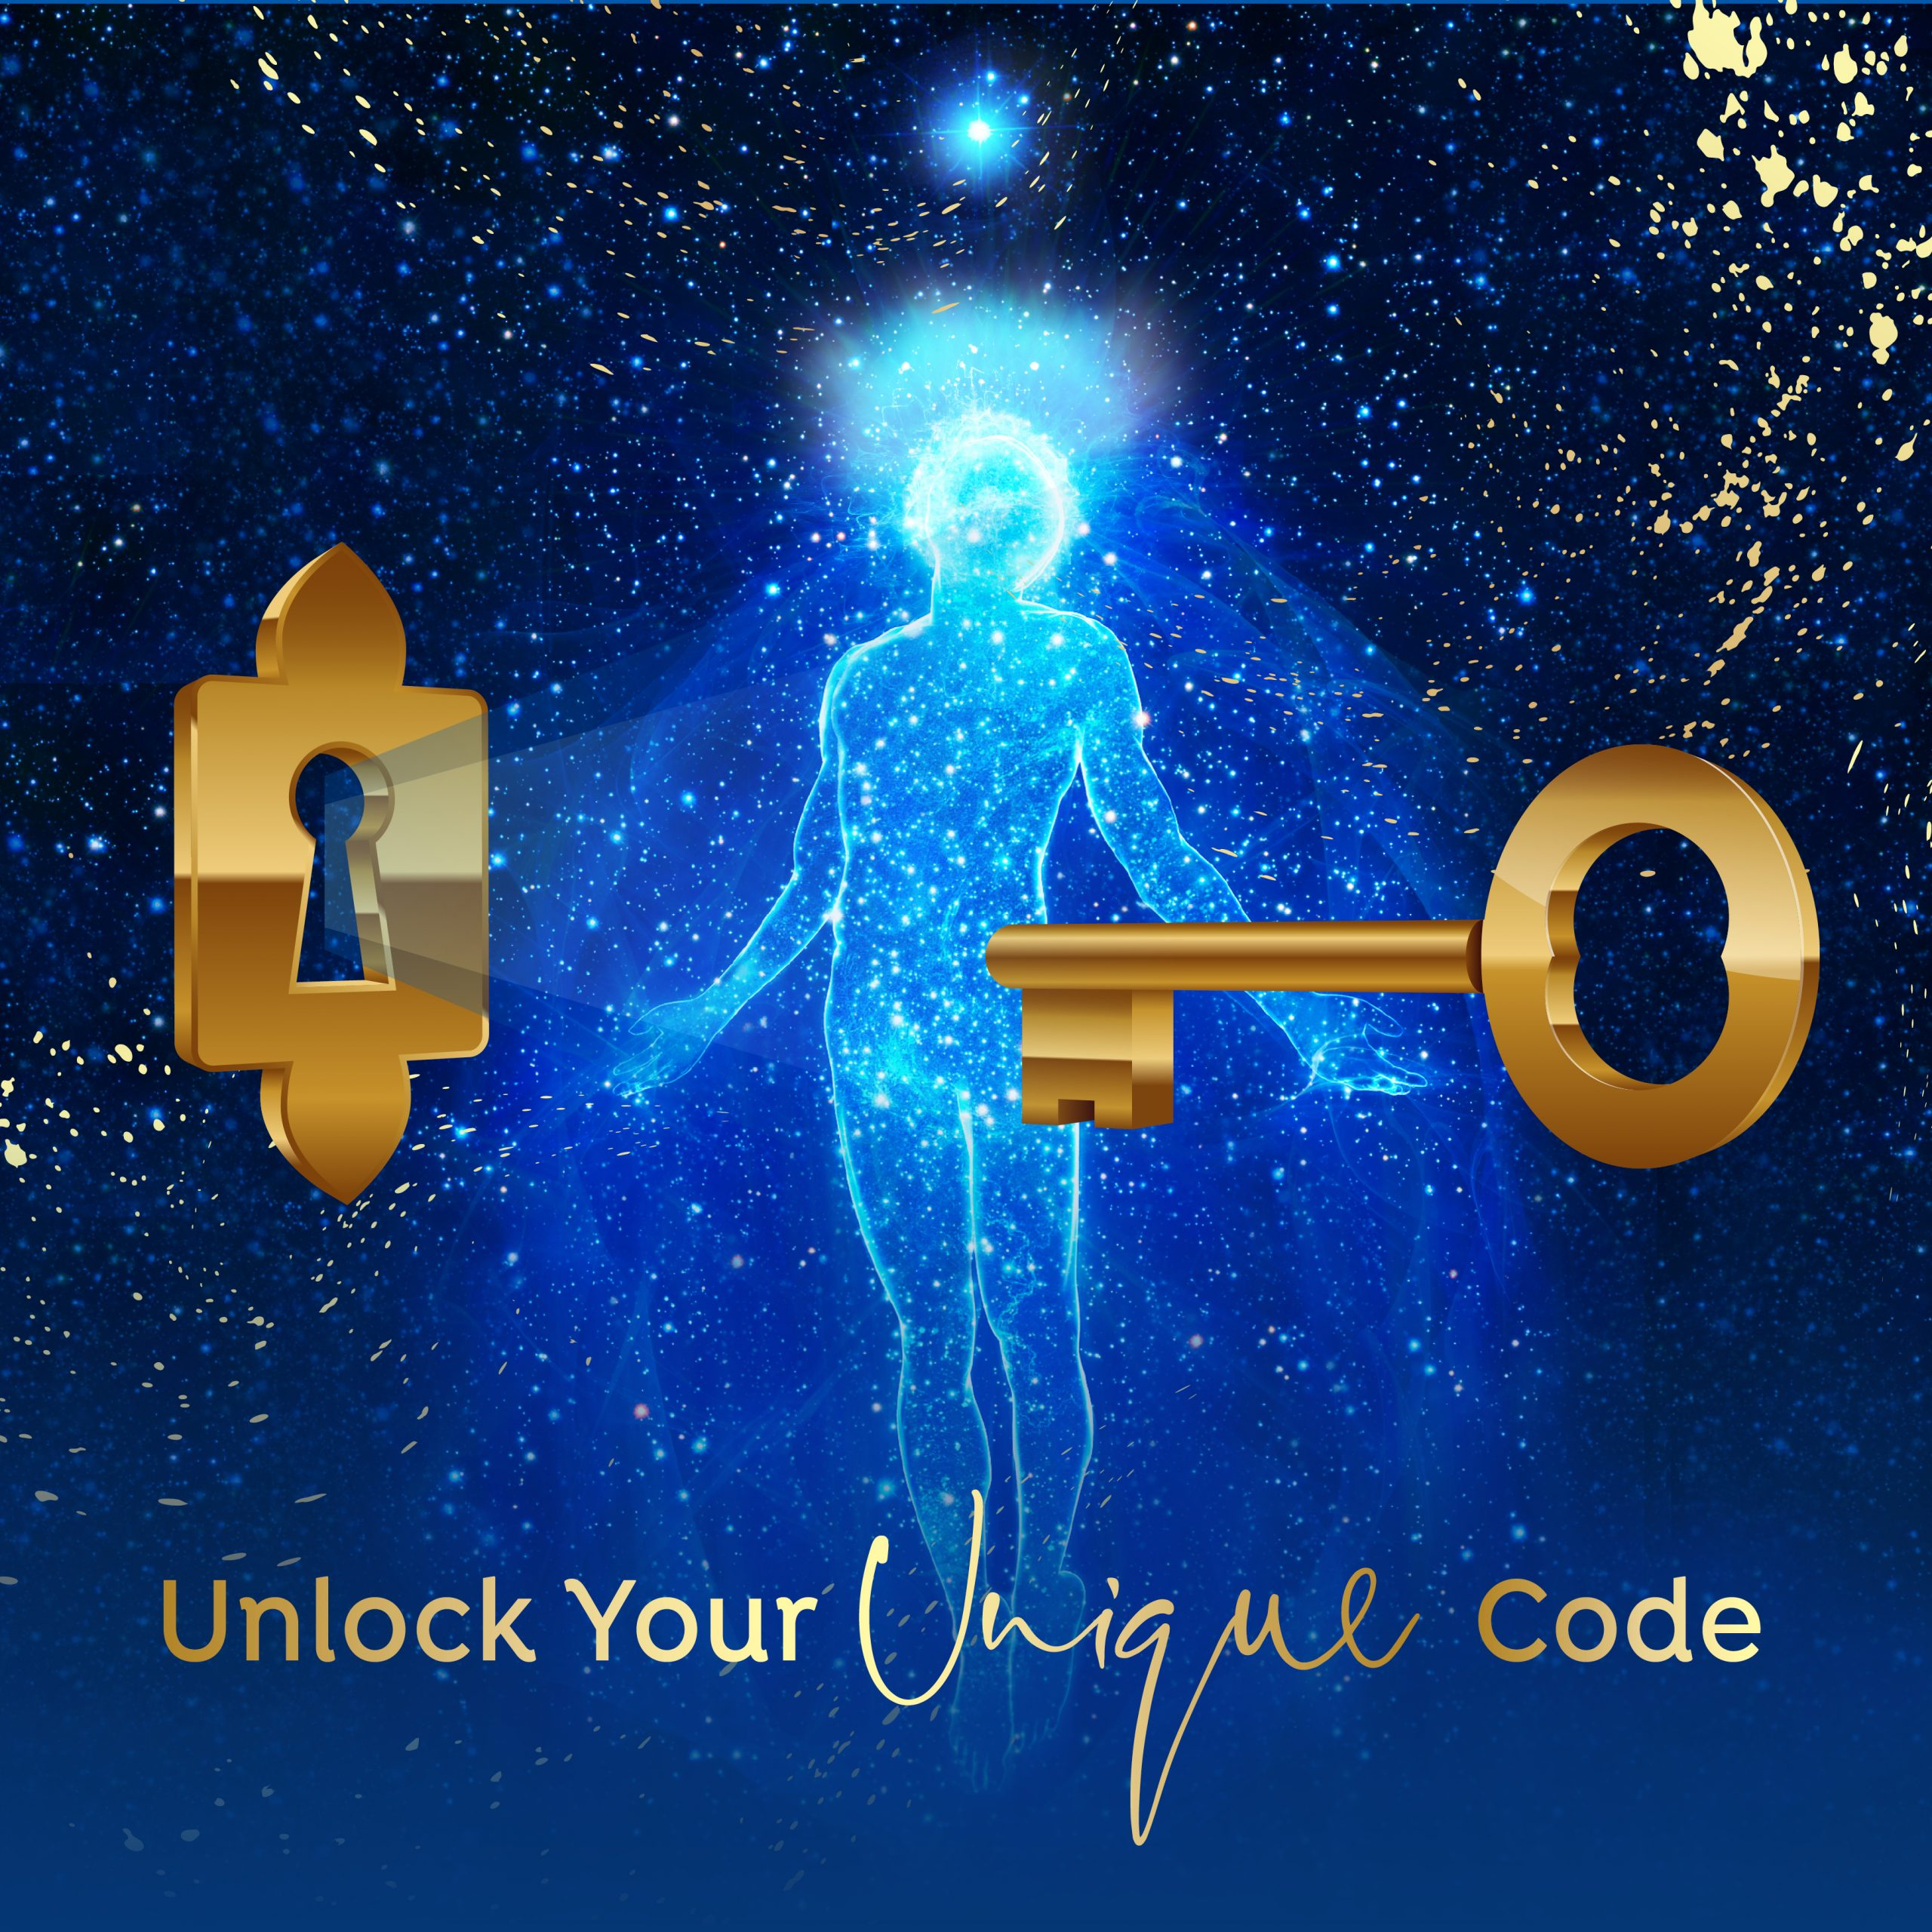 Unlock key image